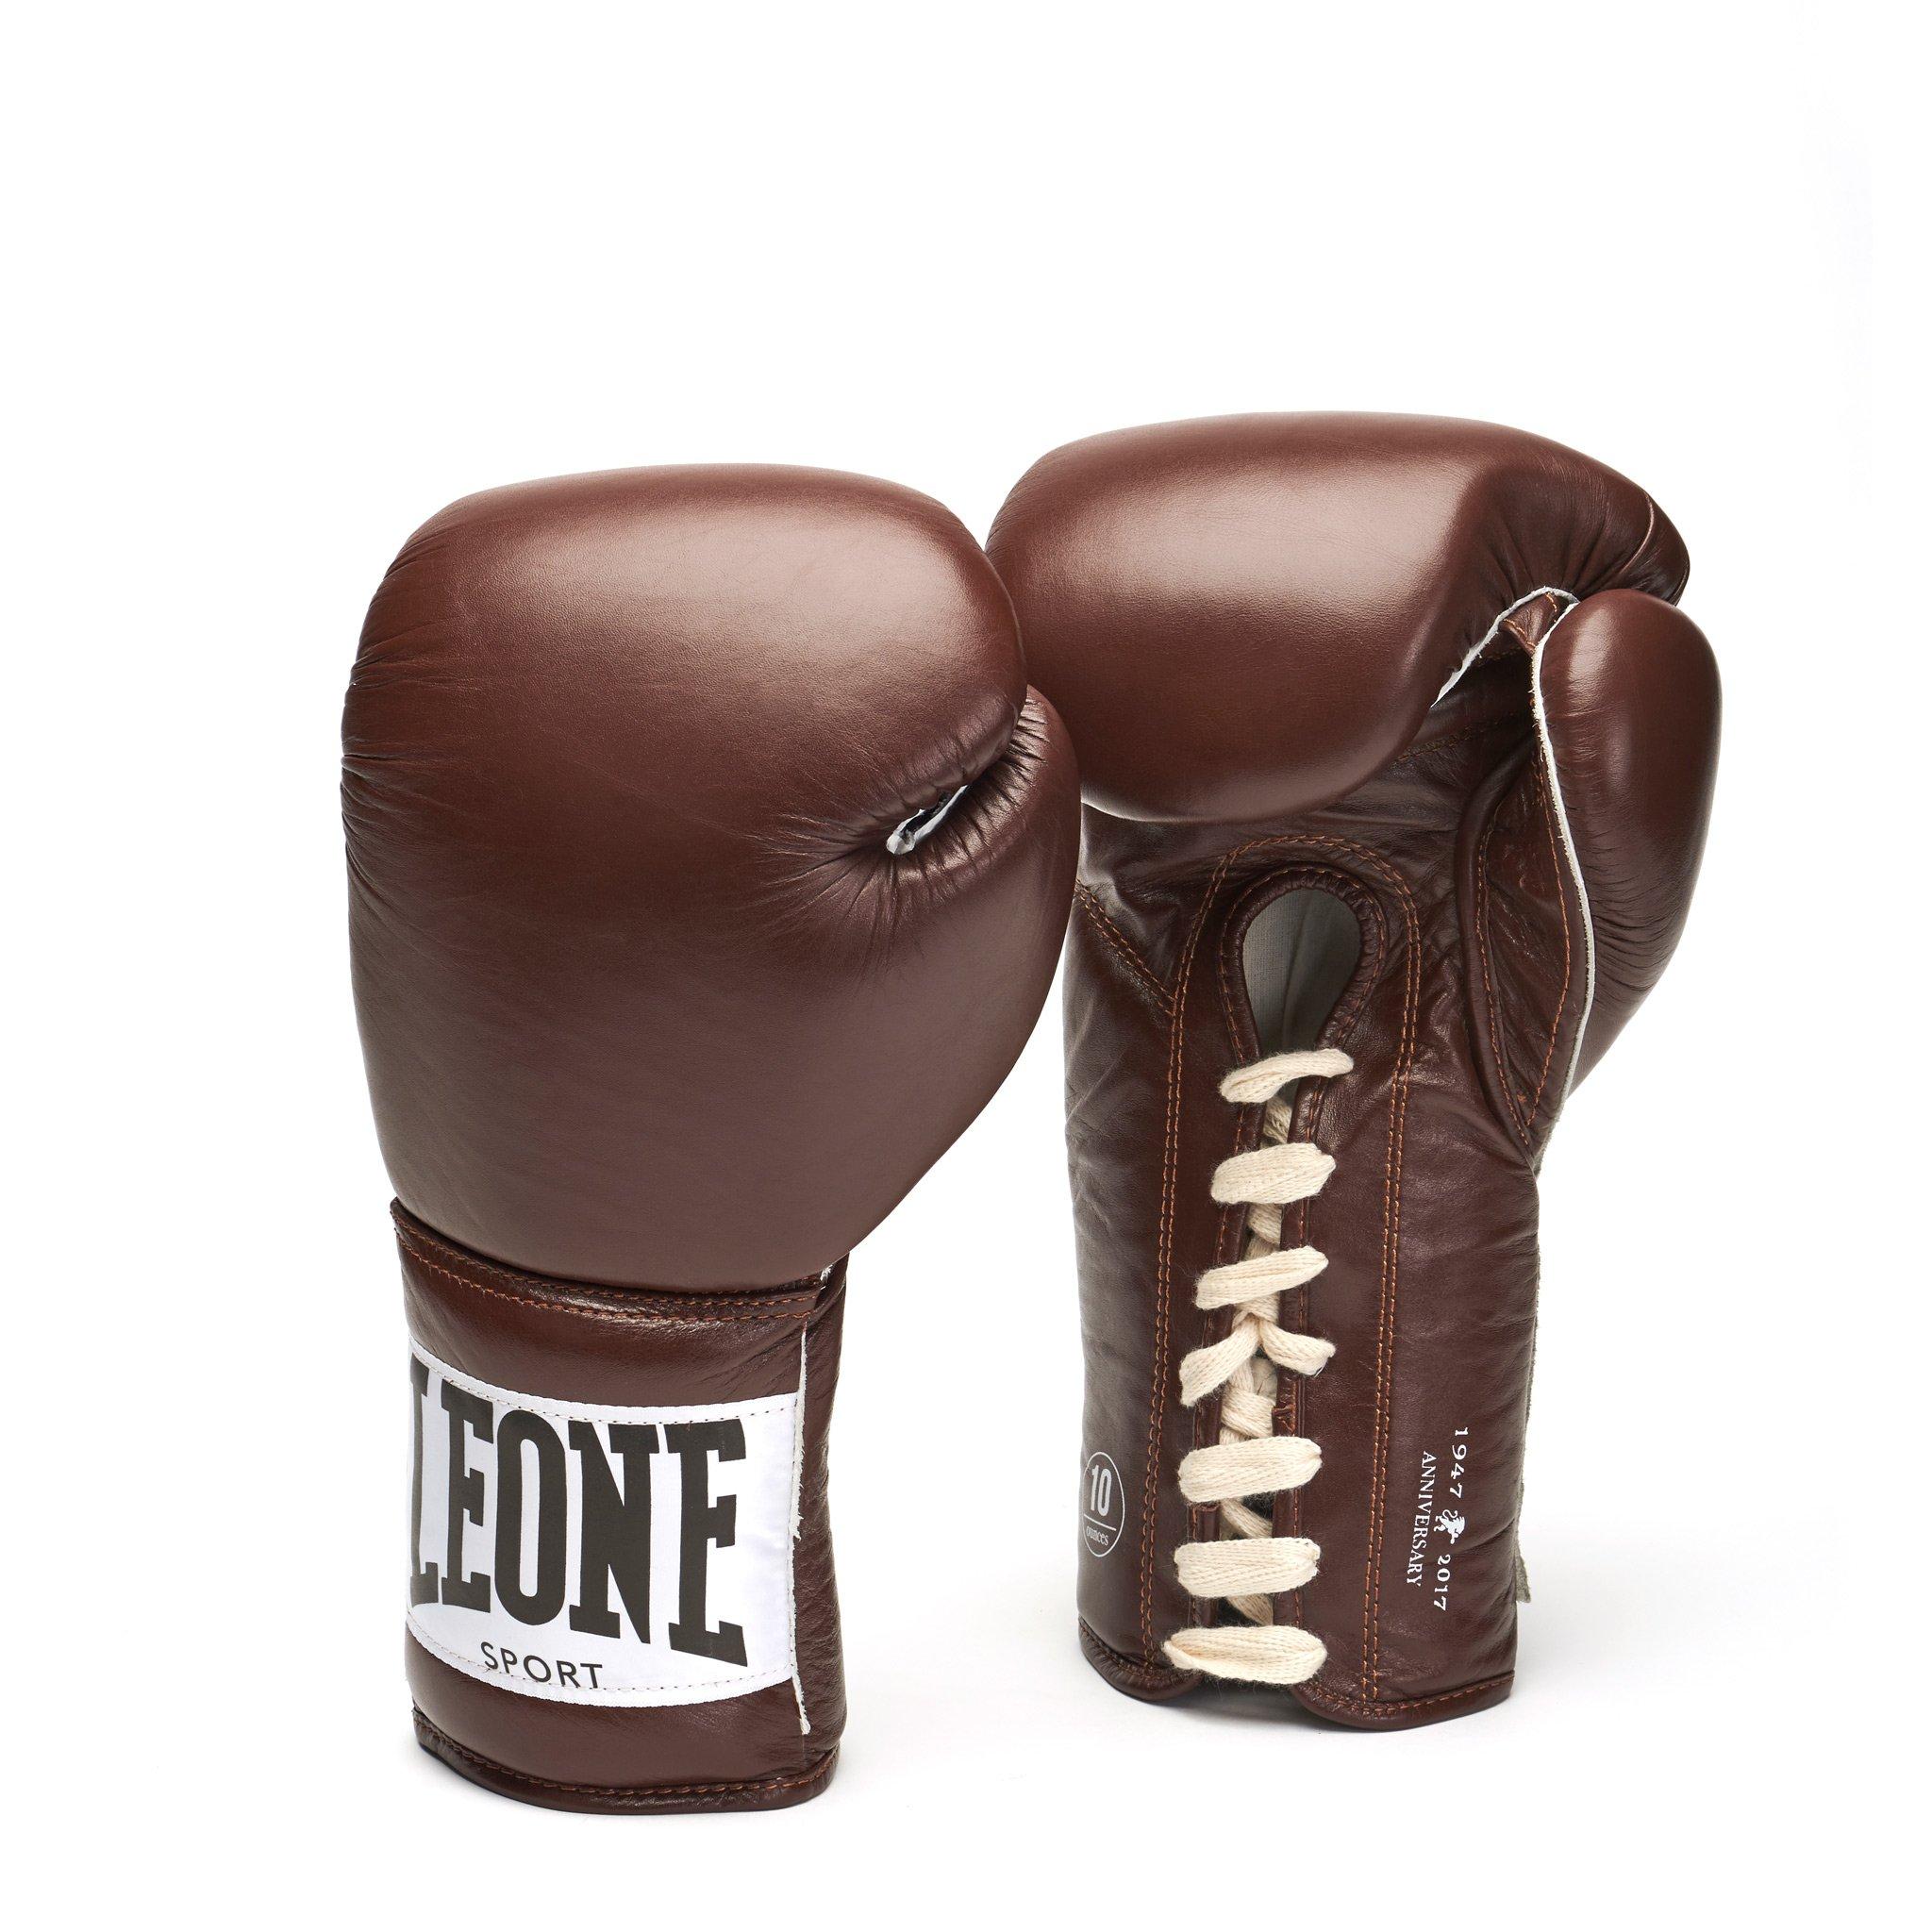 Everlast Boxen Boxhandschuhe 2300 Adults Boxing Gloves